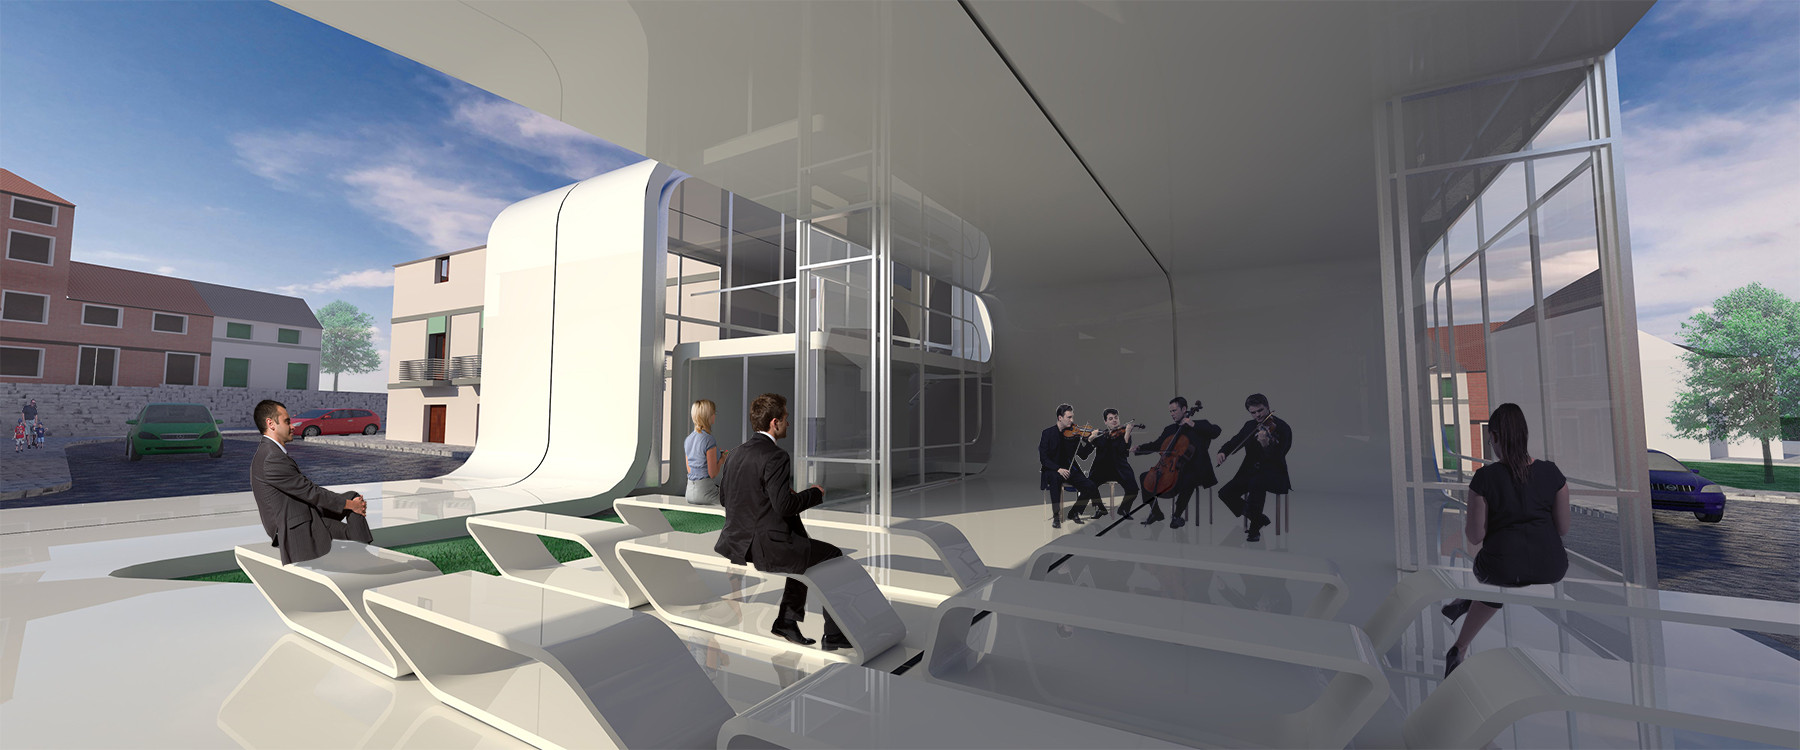 Casa de Bolero Performance SpaceView